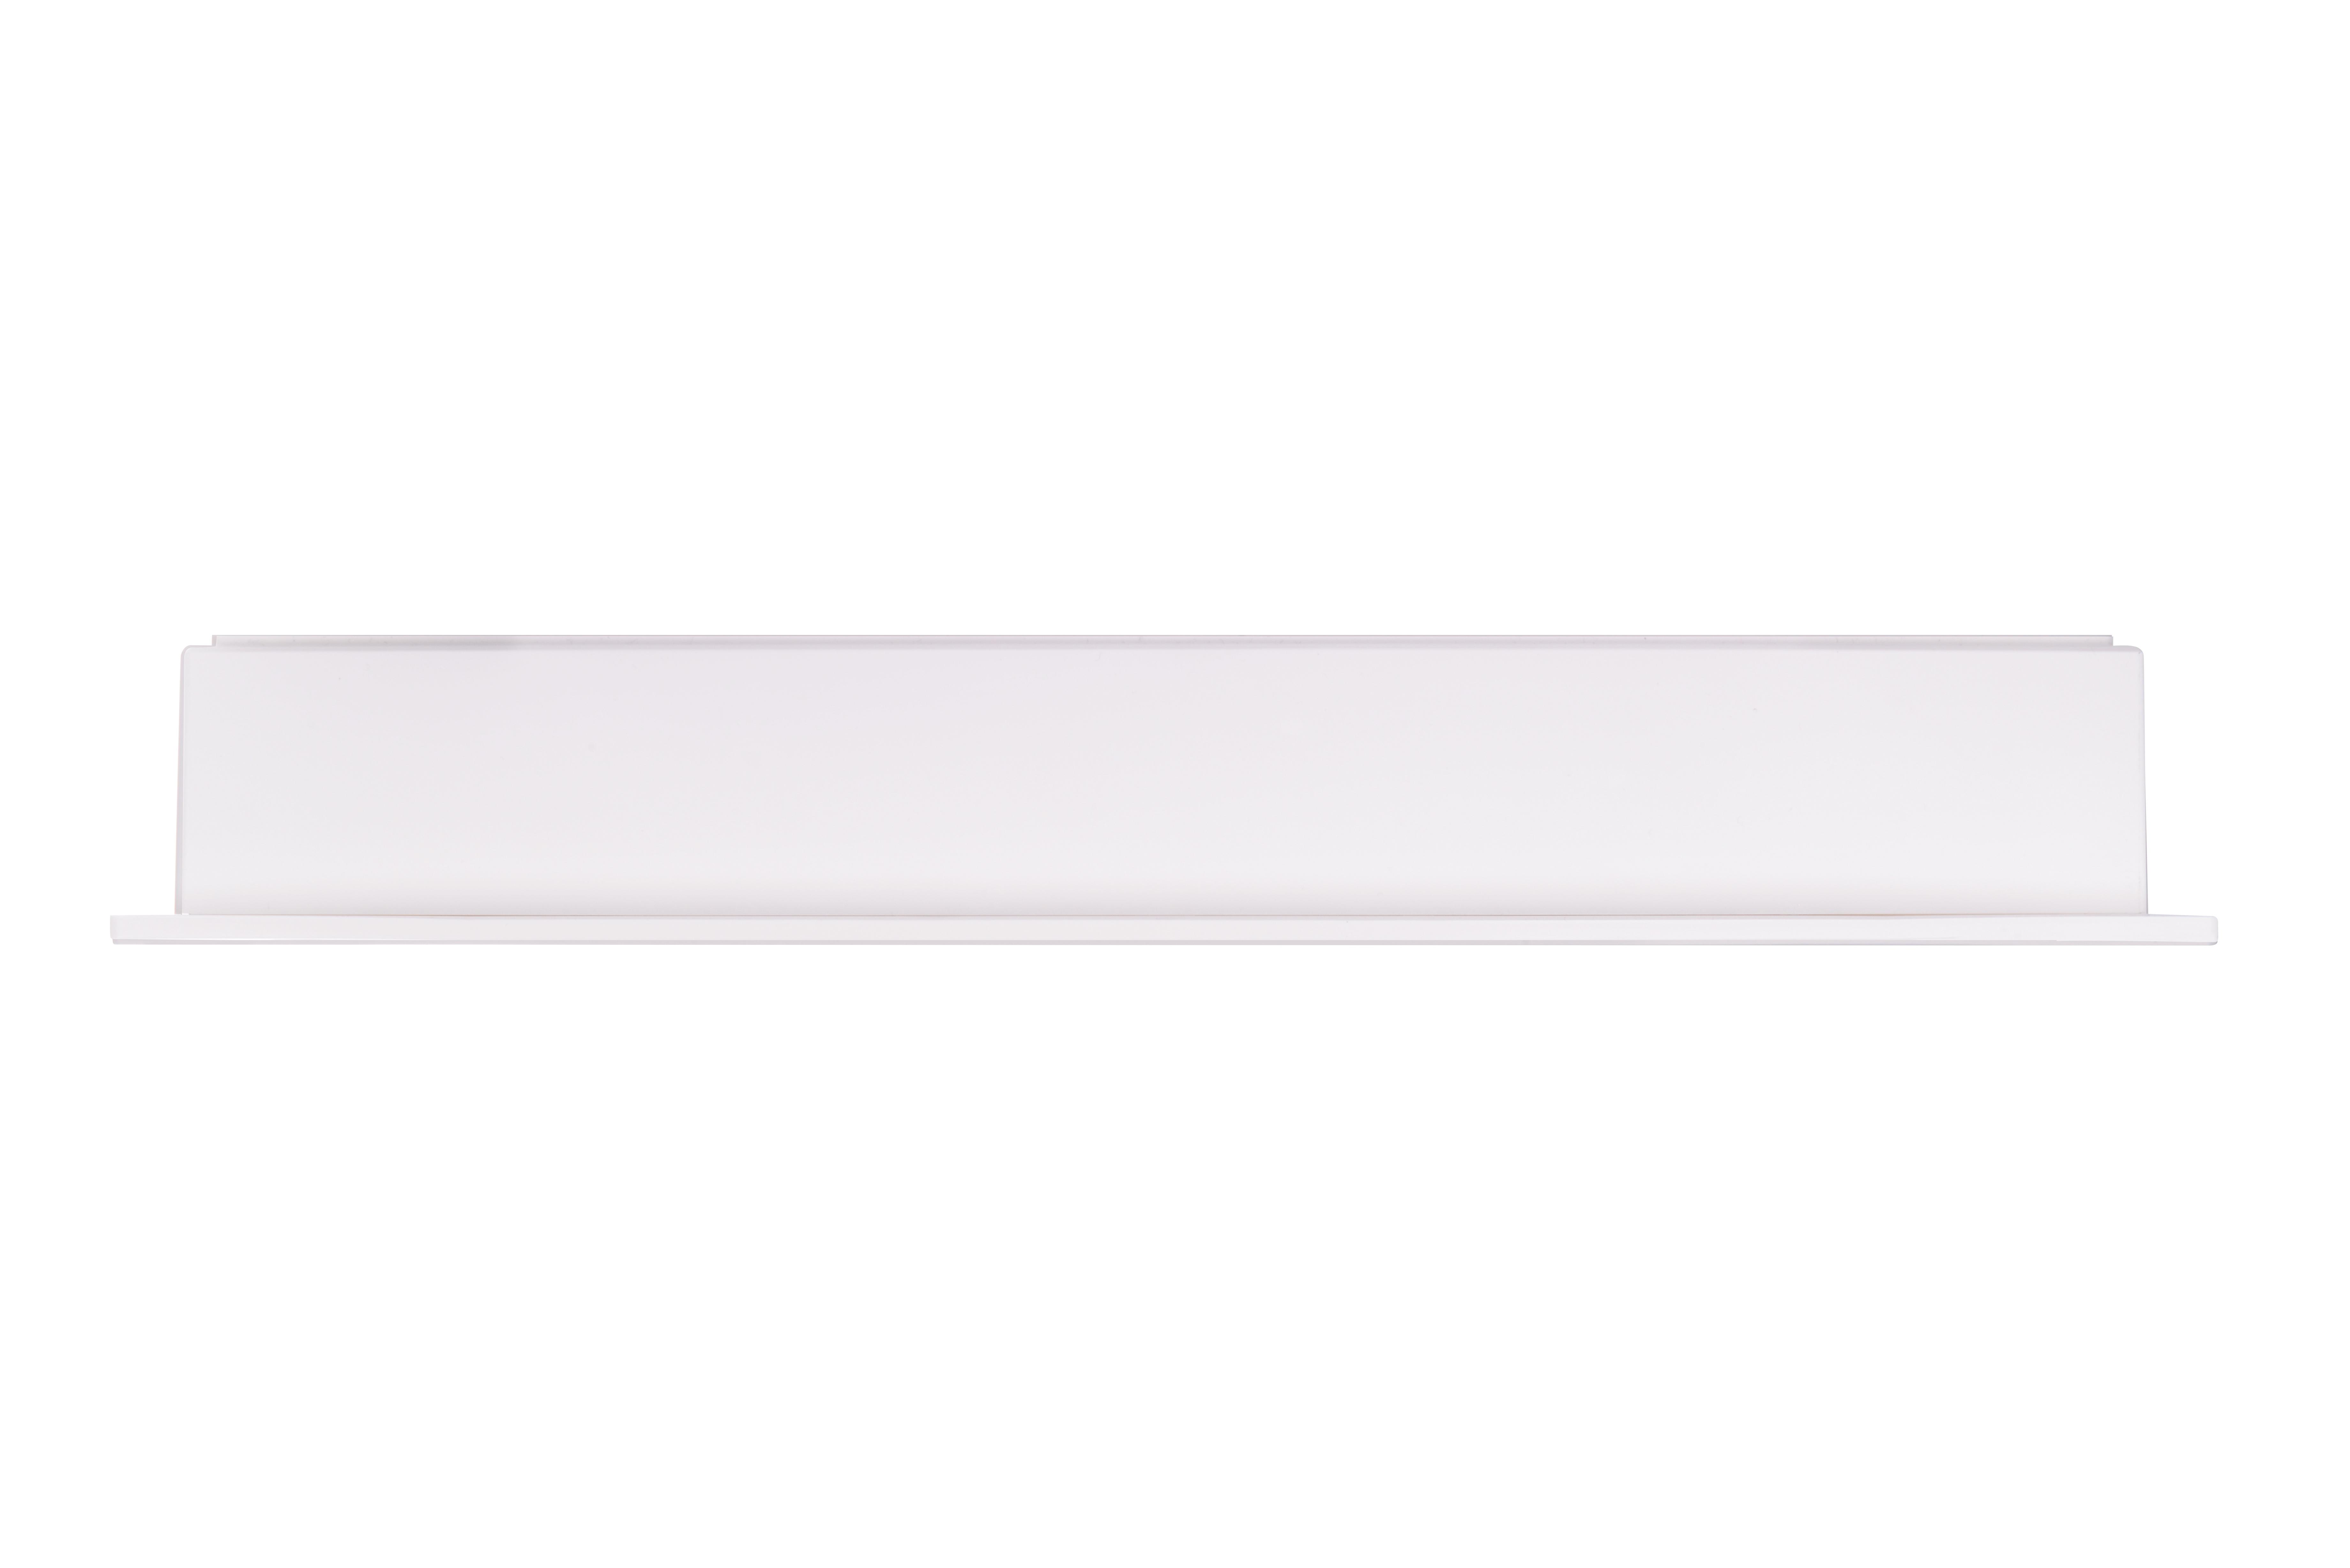 Lampa emergenta led Intelight 94717   3h nementinut test automat5